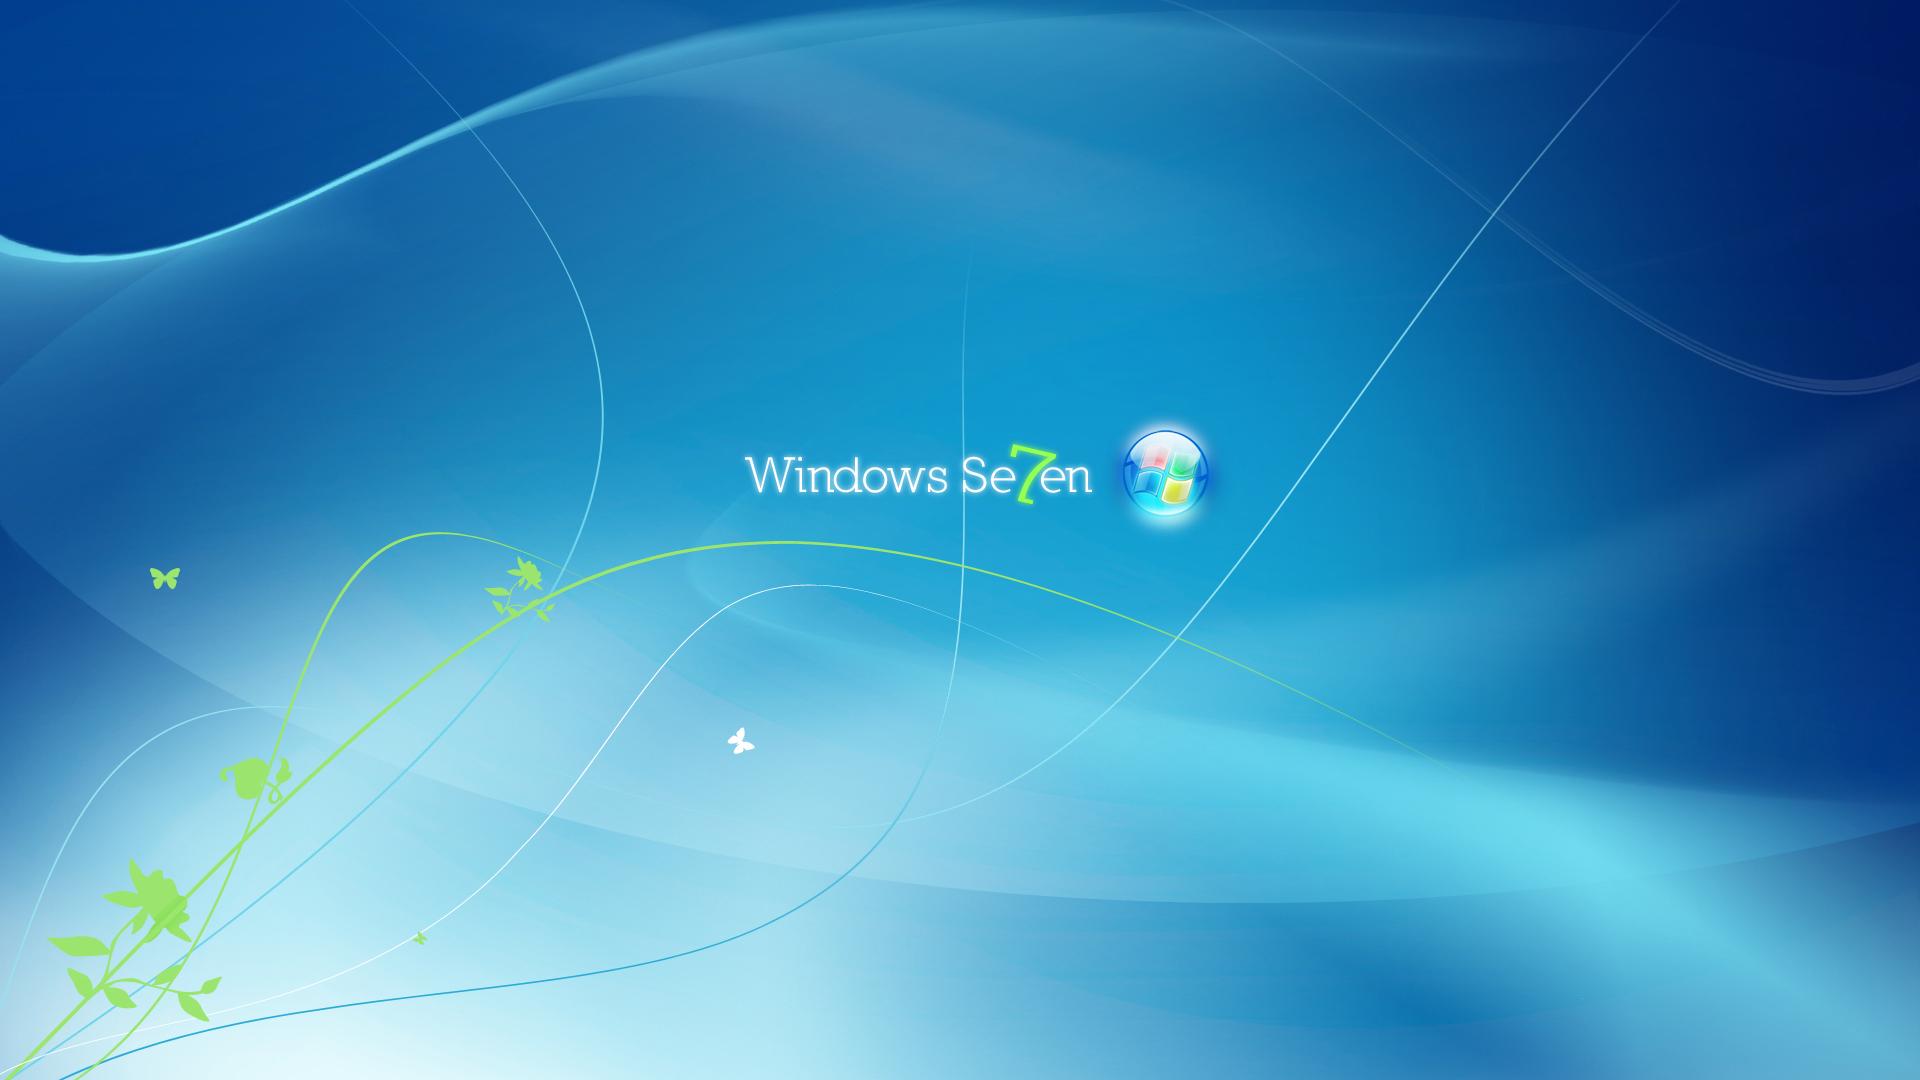 Windows Seven HD 1080p Wallpapers HD Wallpapers 1920x1080